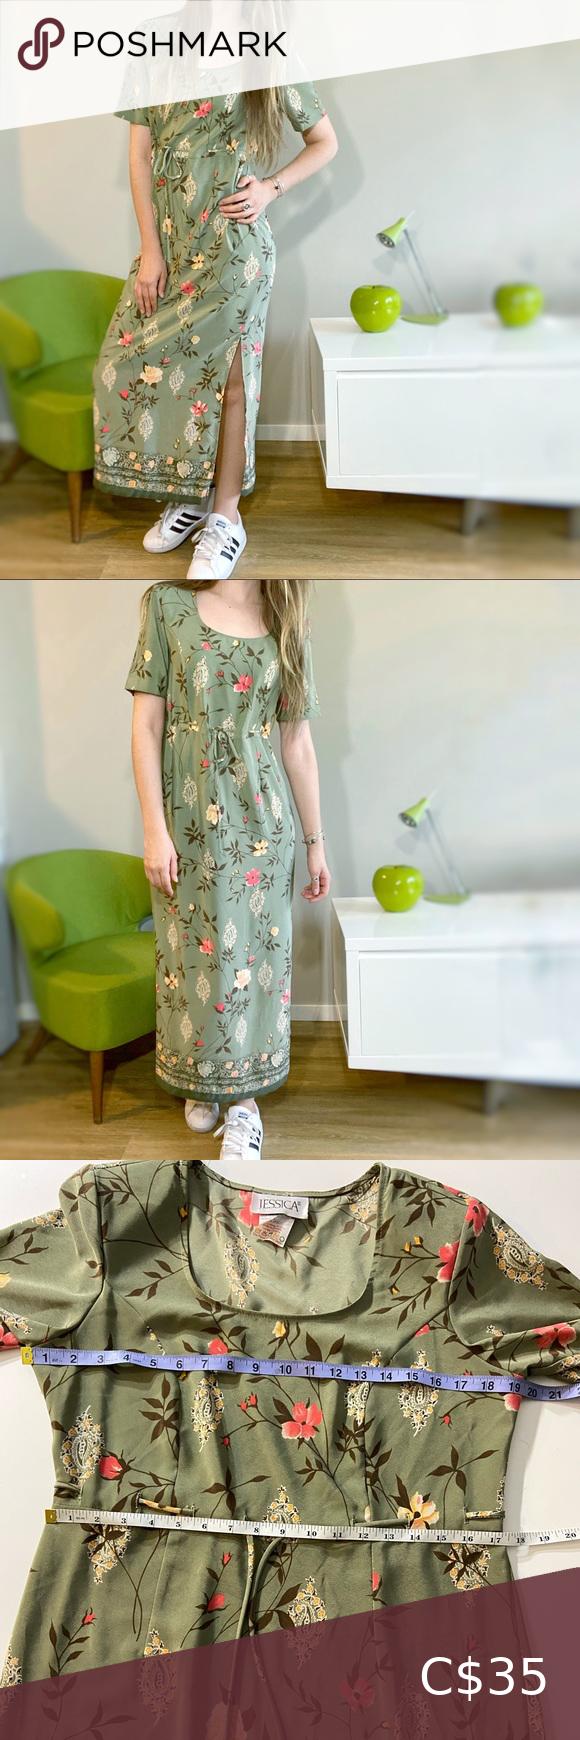 Vintage Floral Paisley Green Maxi Summer Dress Summer Dresses Summer Maxi Dress Vintage Summer Dresses [ 1740 x 580 Pixel ]